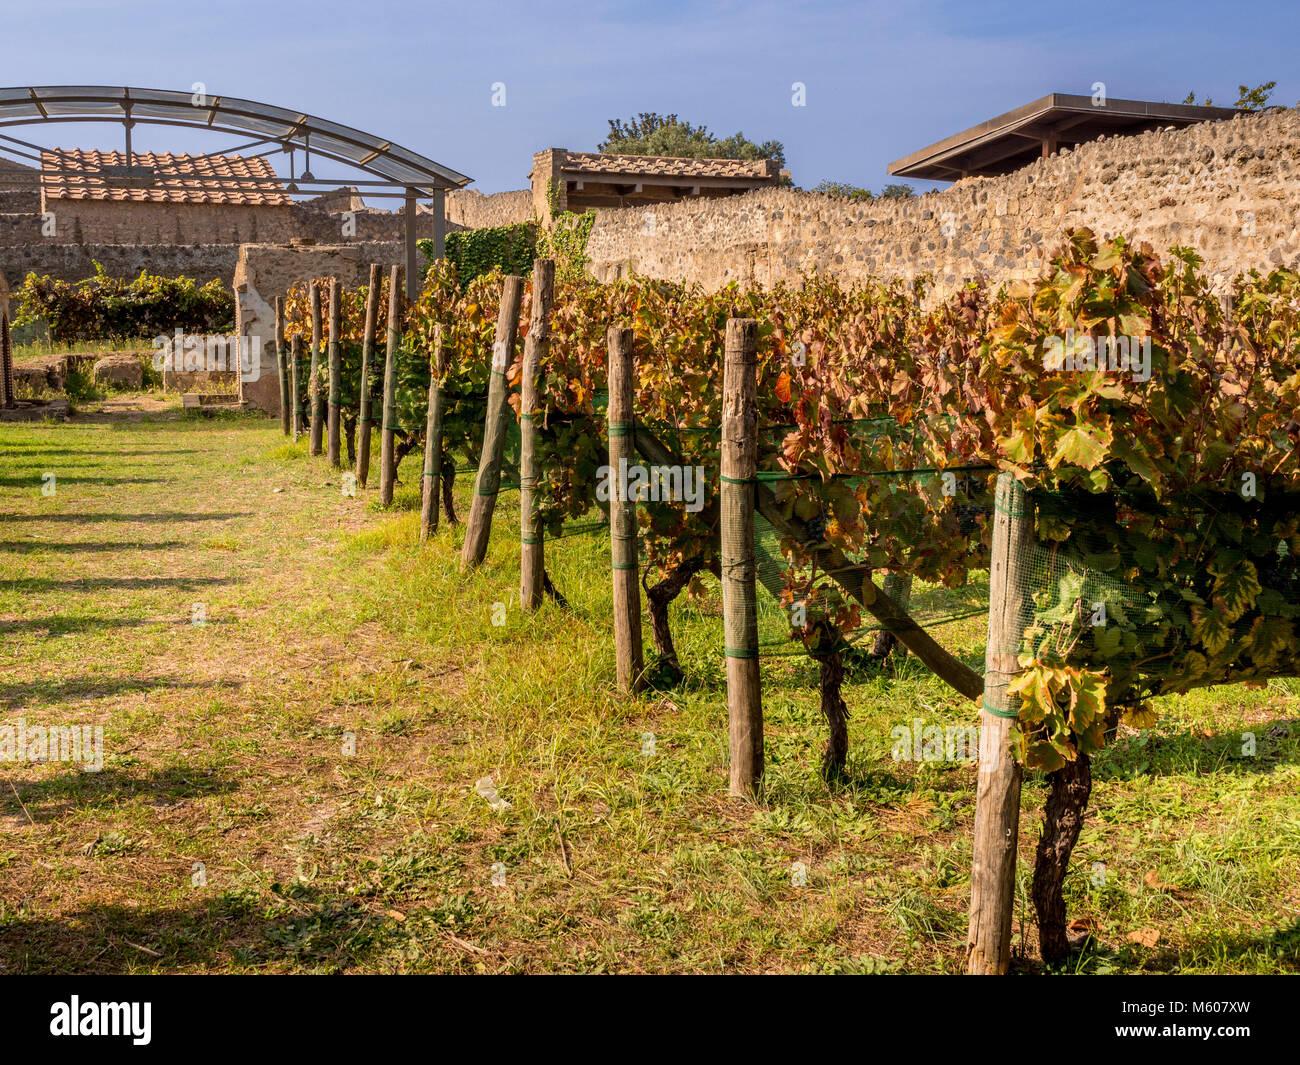 Reproduction vineyard at Casa del Triclinio Estivo, Pompeii, Italy. - Stock Image